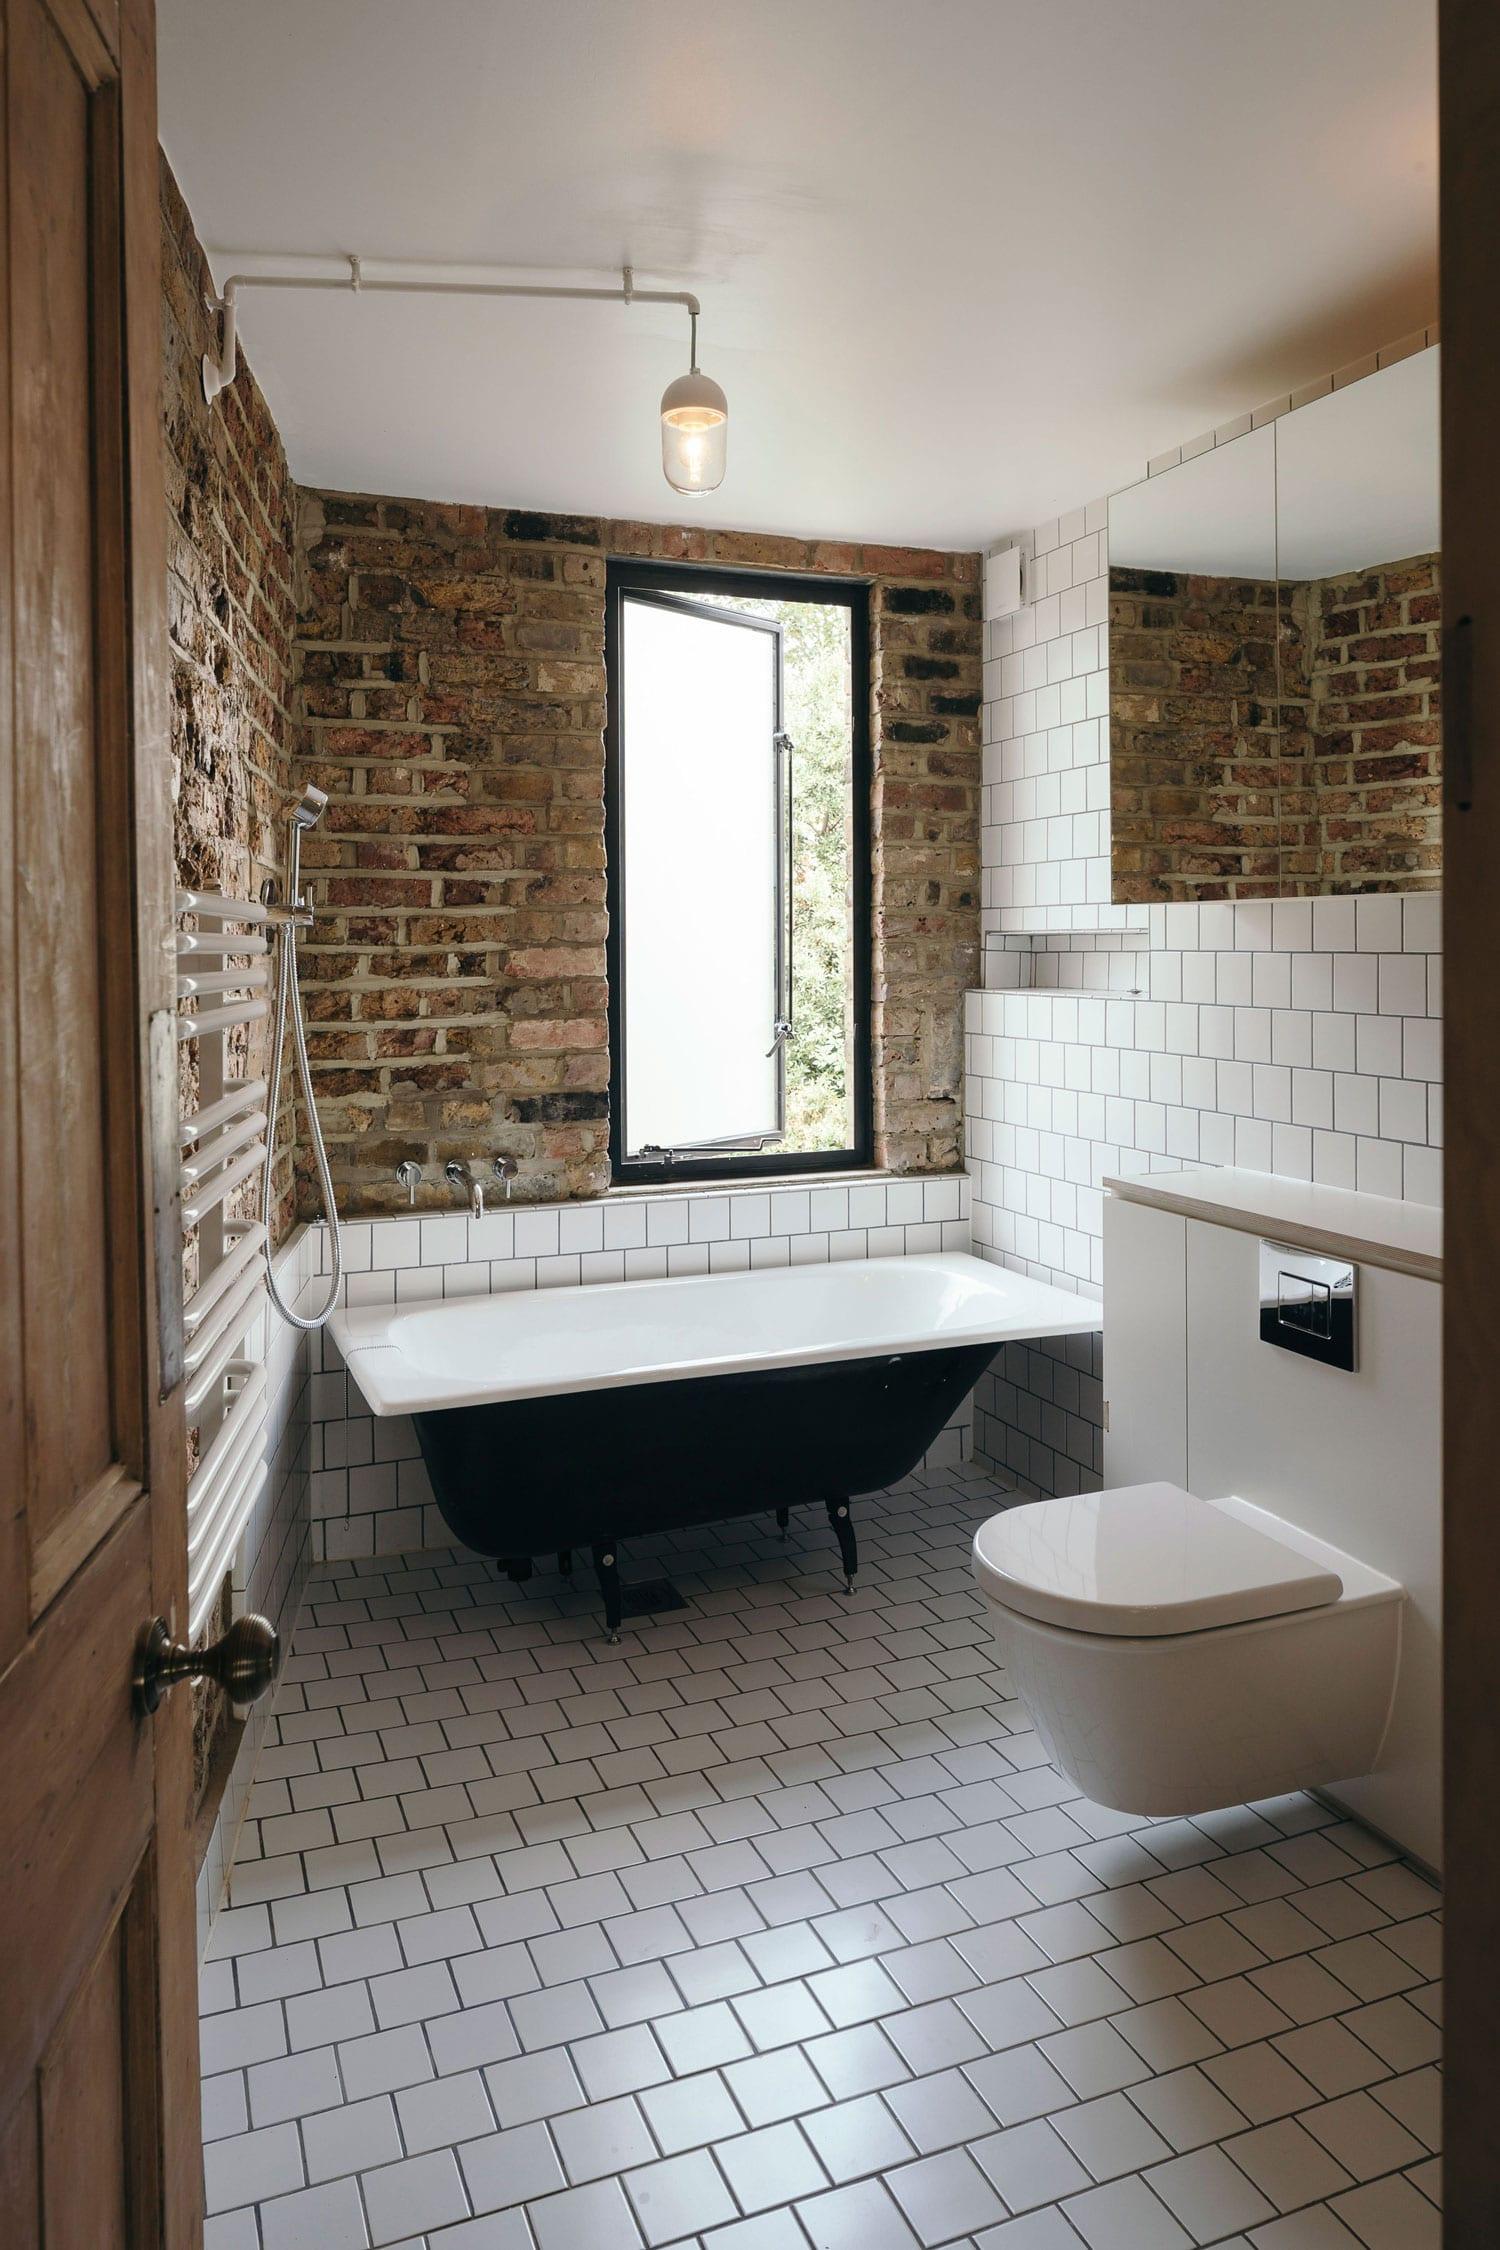 tsuruta architects radically refurbish a former squat house london.